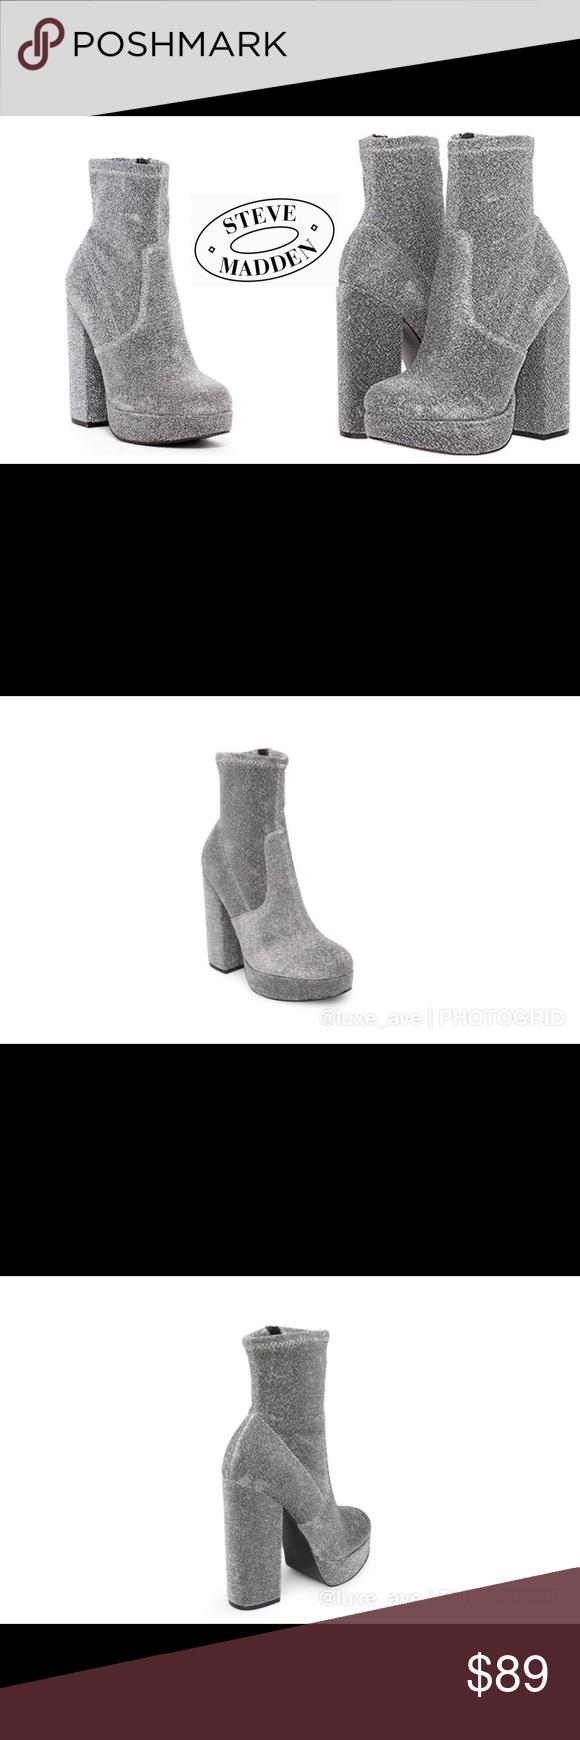 08a15cb995b8 Steve Madden Stardust ⭐ Platform Fashion Boots Steve Madden Stardust Fashion  Boot. Rock out